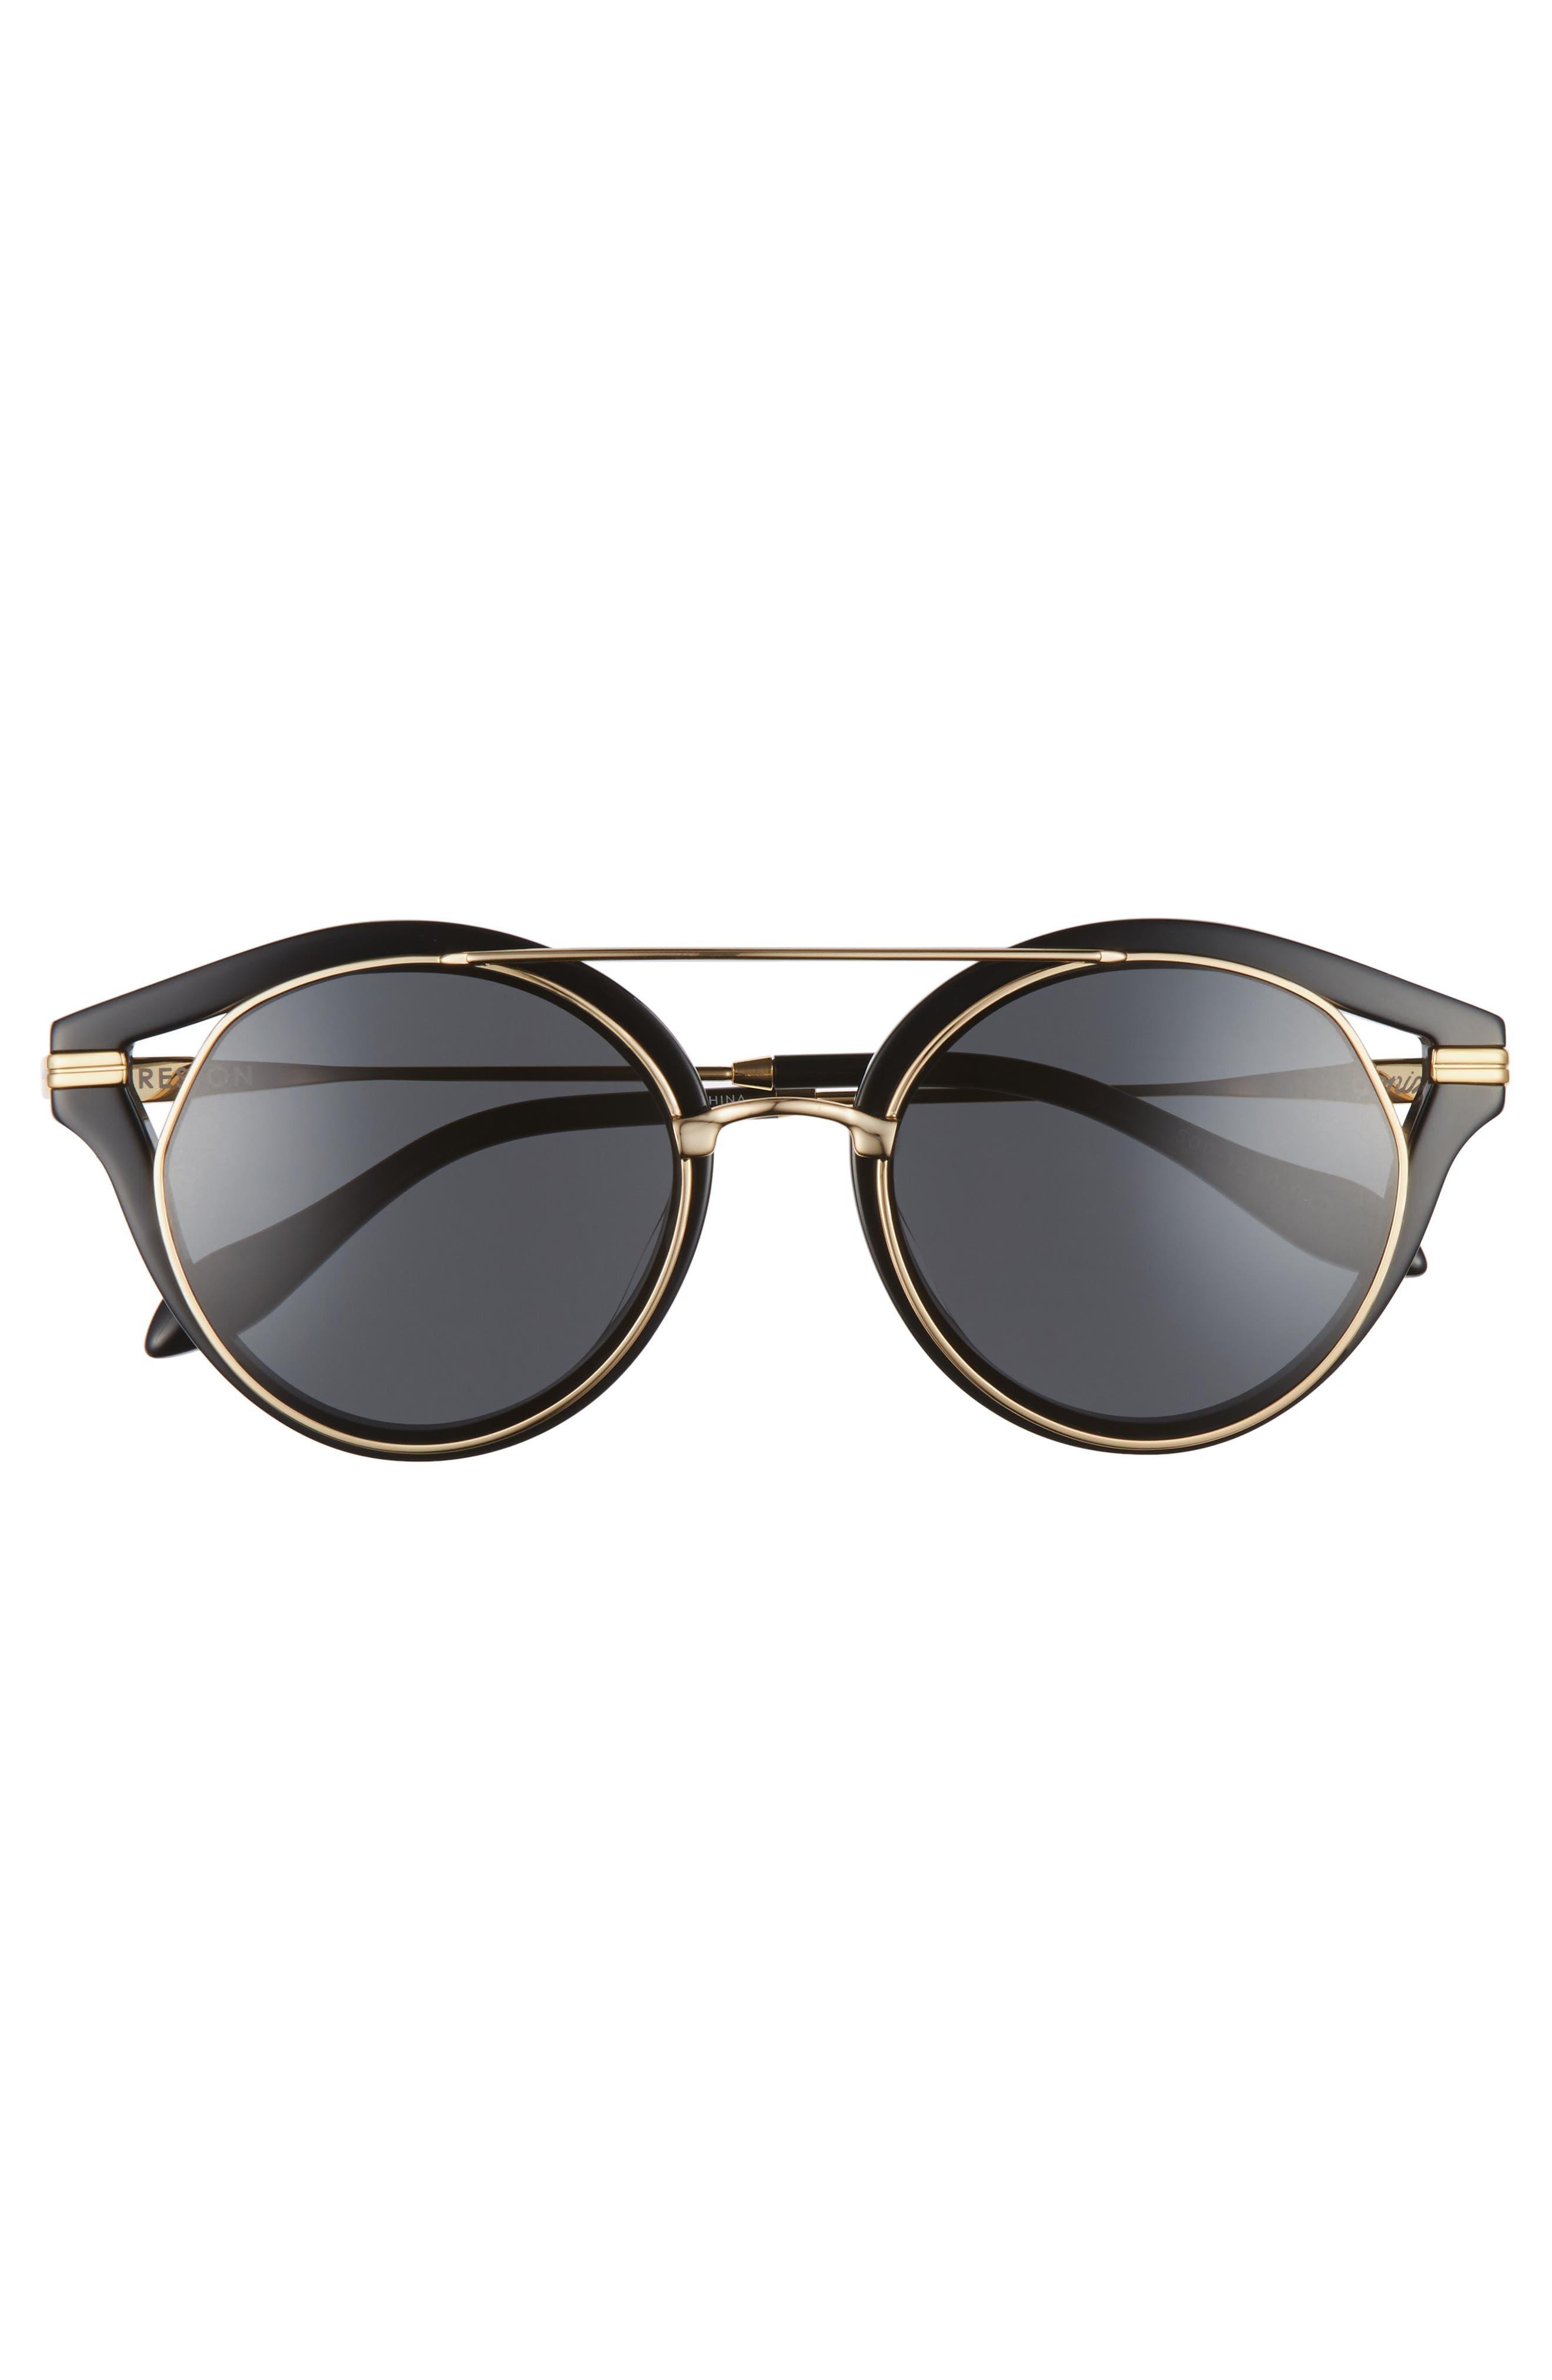 SONIX,                             Preston 51mm Gradient Round Sunglasses,                             Alternate thumbnail 3, color,                             001